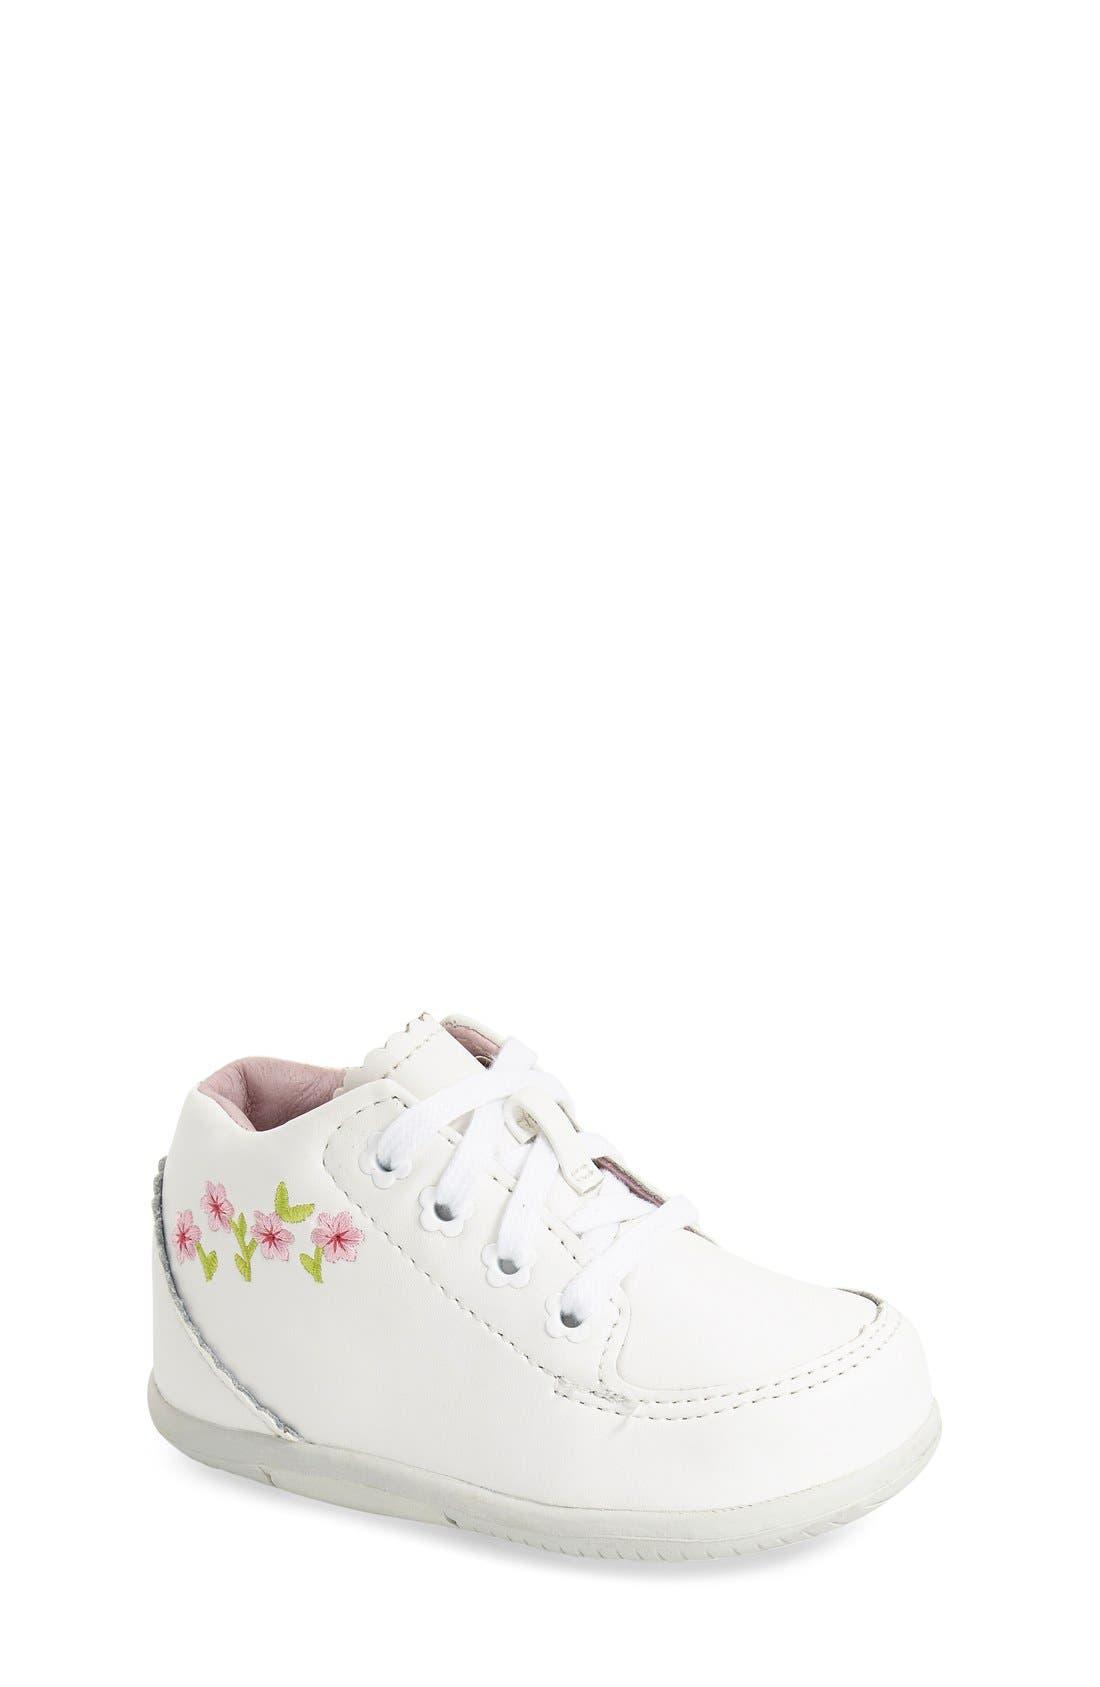 'Emilia' Leather Boot,                         Main,                         color, WHITE